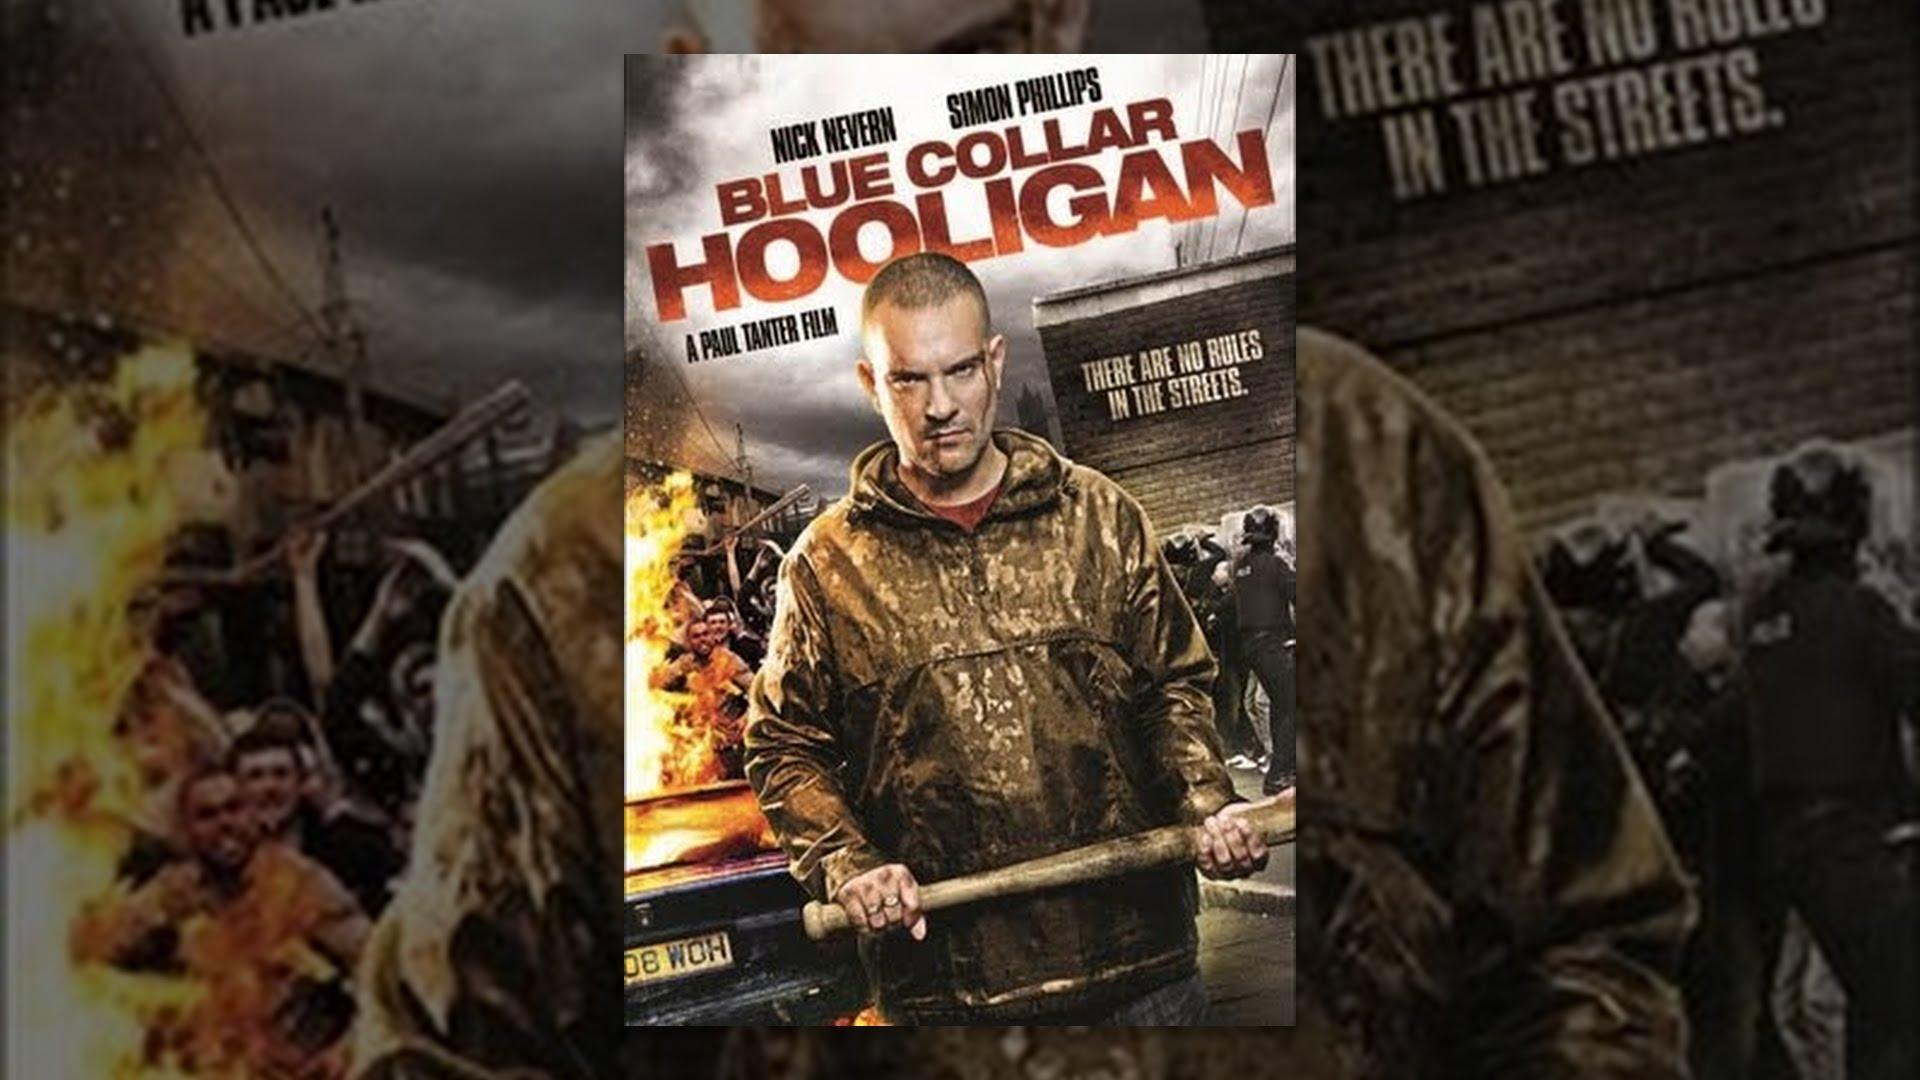 Download Blue Collar Hooligan